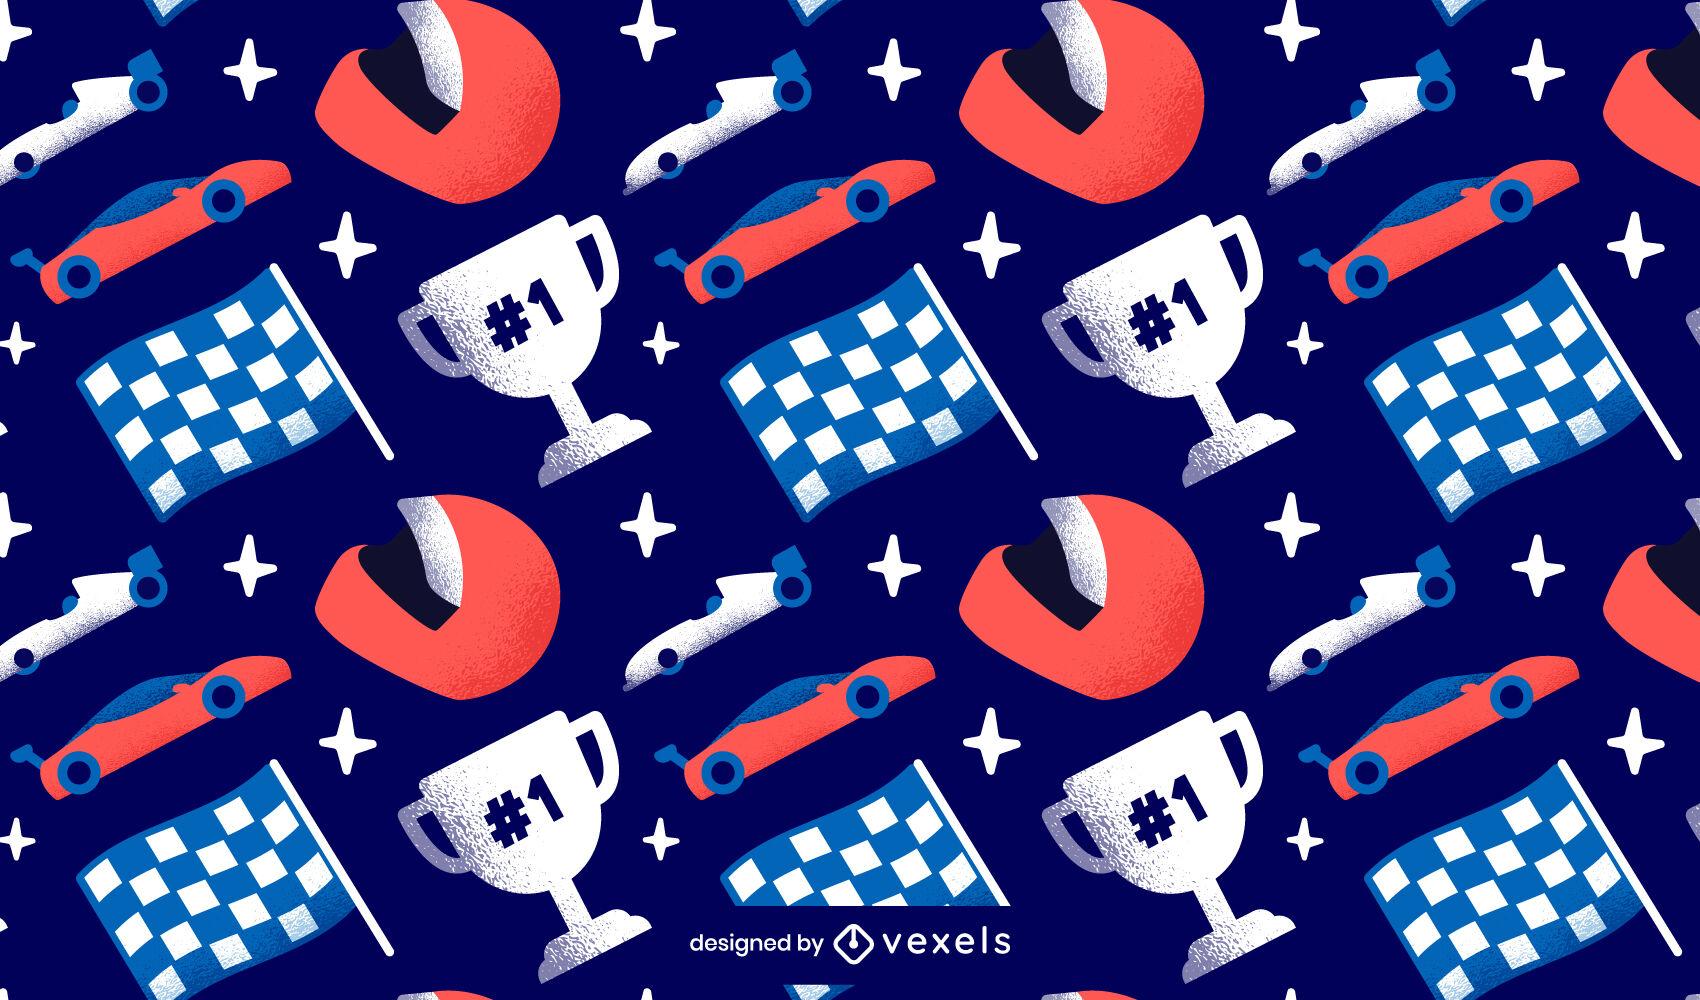 Car race competition pattern design